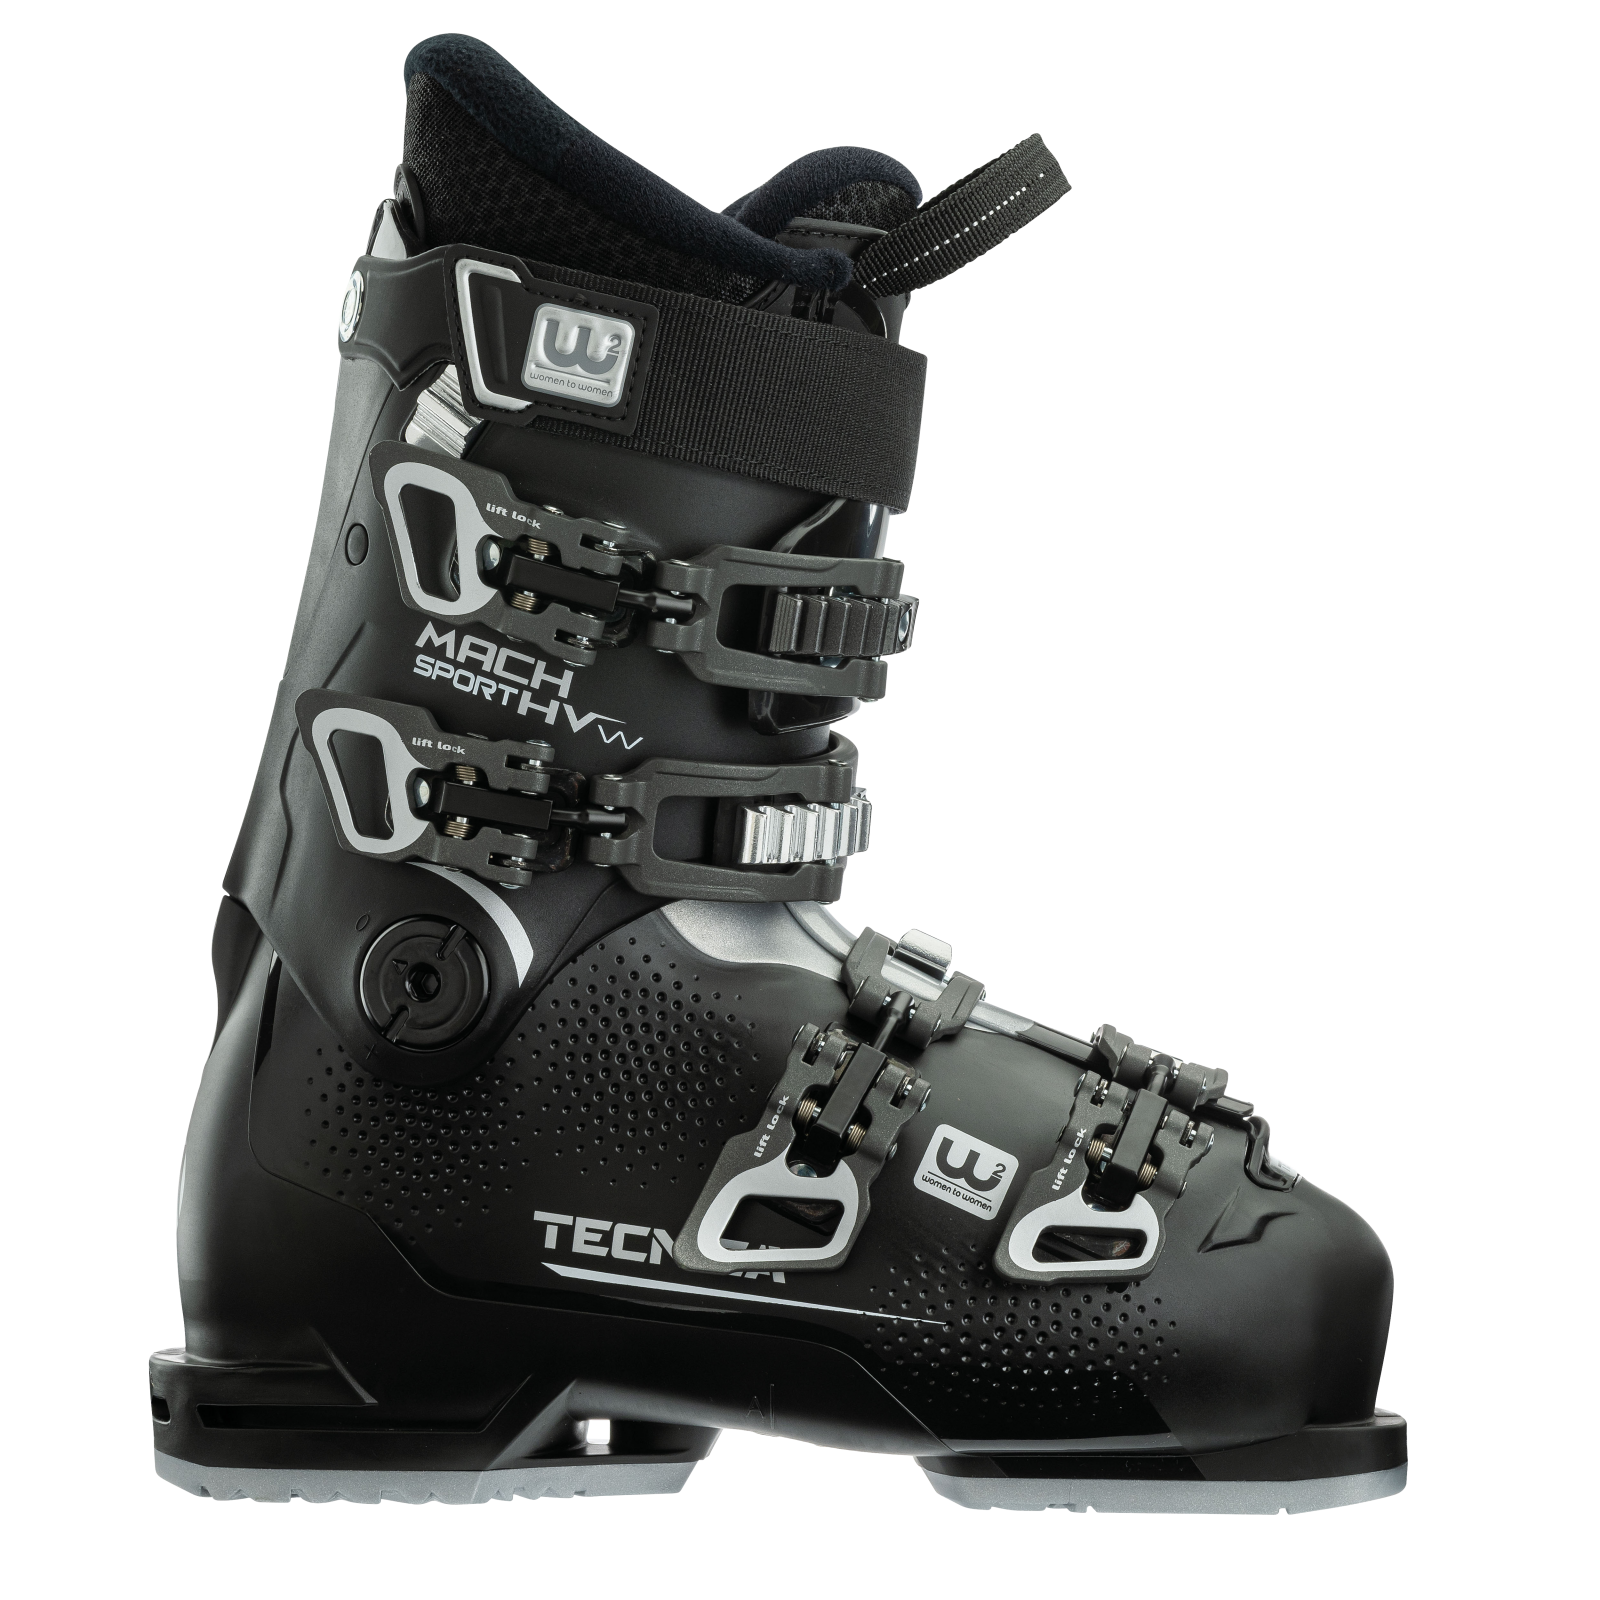 2022 Tecnica Mach Sport HV 65 Women's Ski Boots